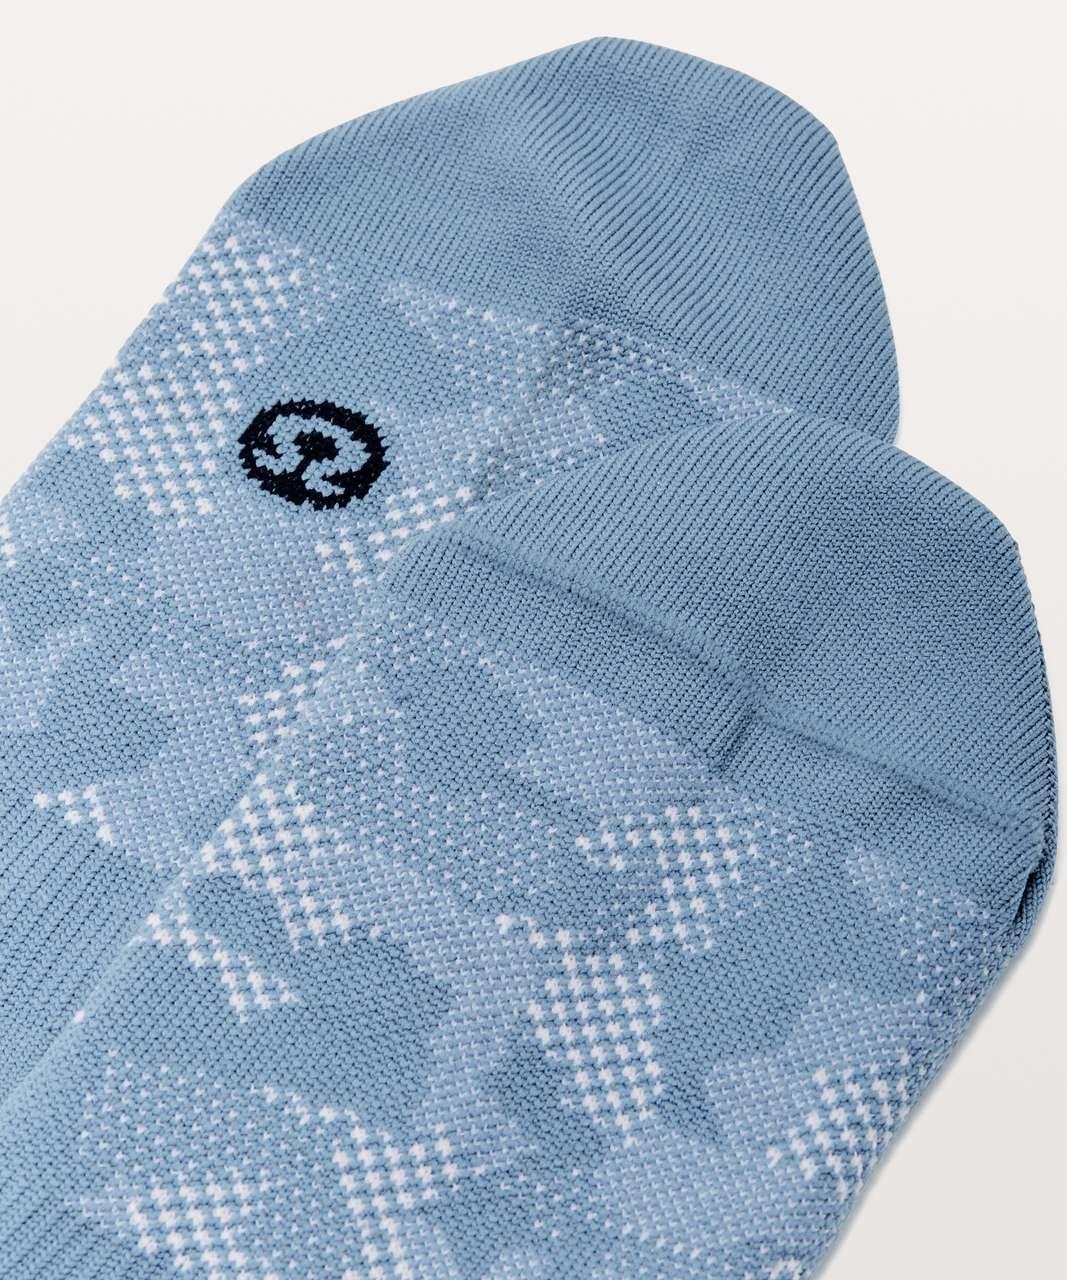 Lululemon No Sock Sock - Utility Blue / White